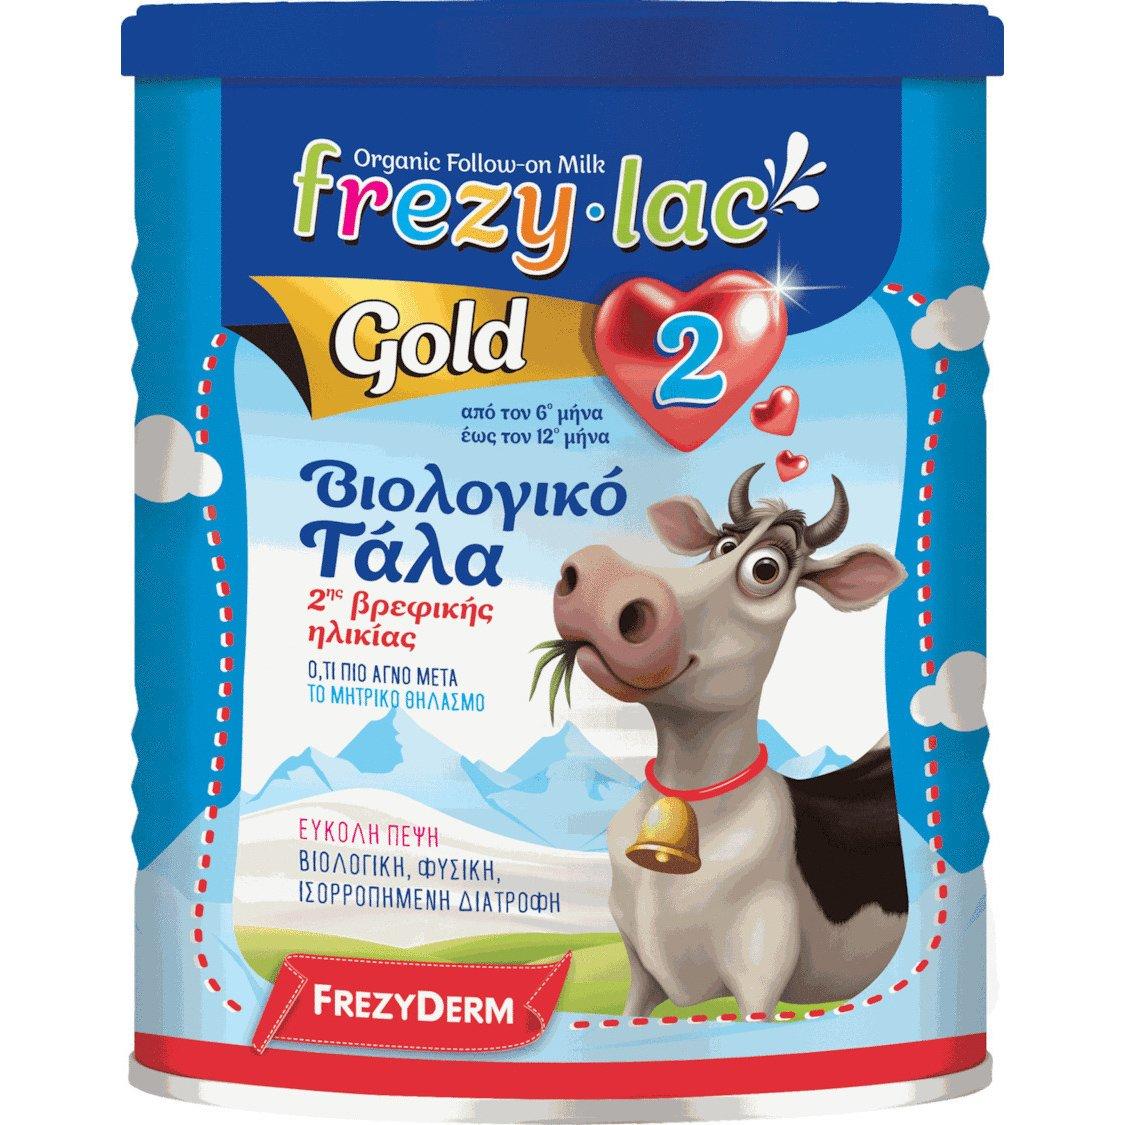 Frezyderm Frezylac Gold 2 Αγελαδινό Βιολογικό Γάλα 2ης Βρεφικής Ηλικίας από τον 6ο Έως τον 12ο Μήνα 400gr